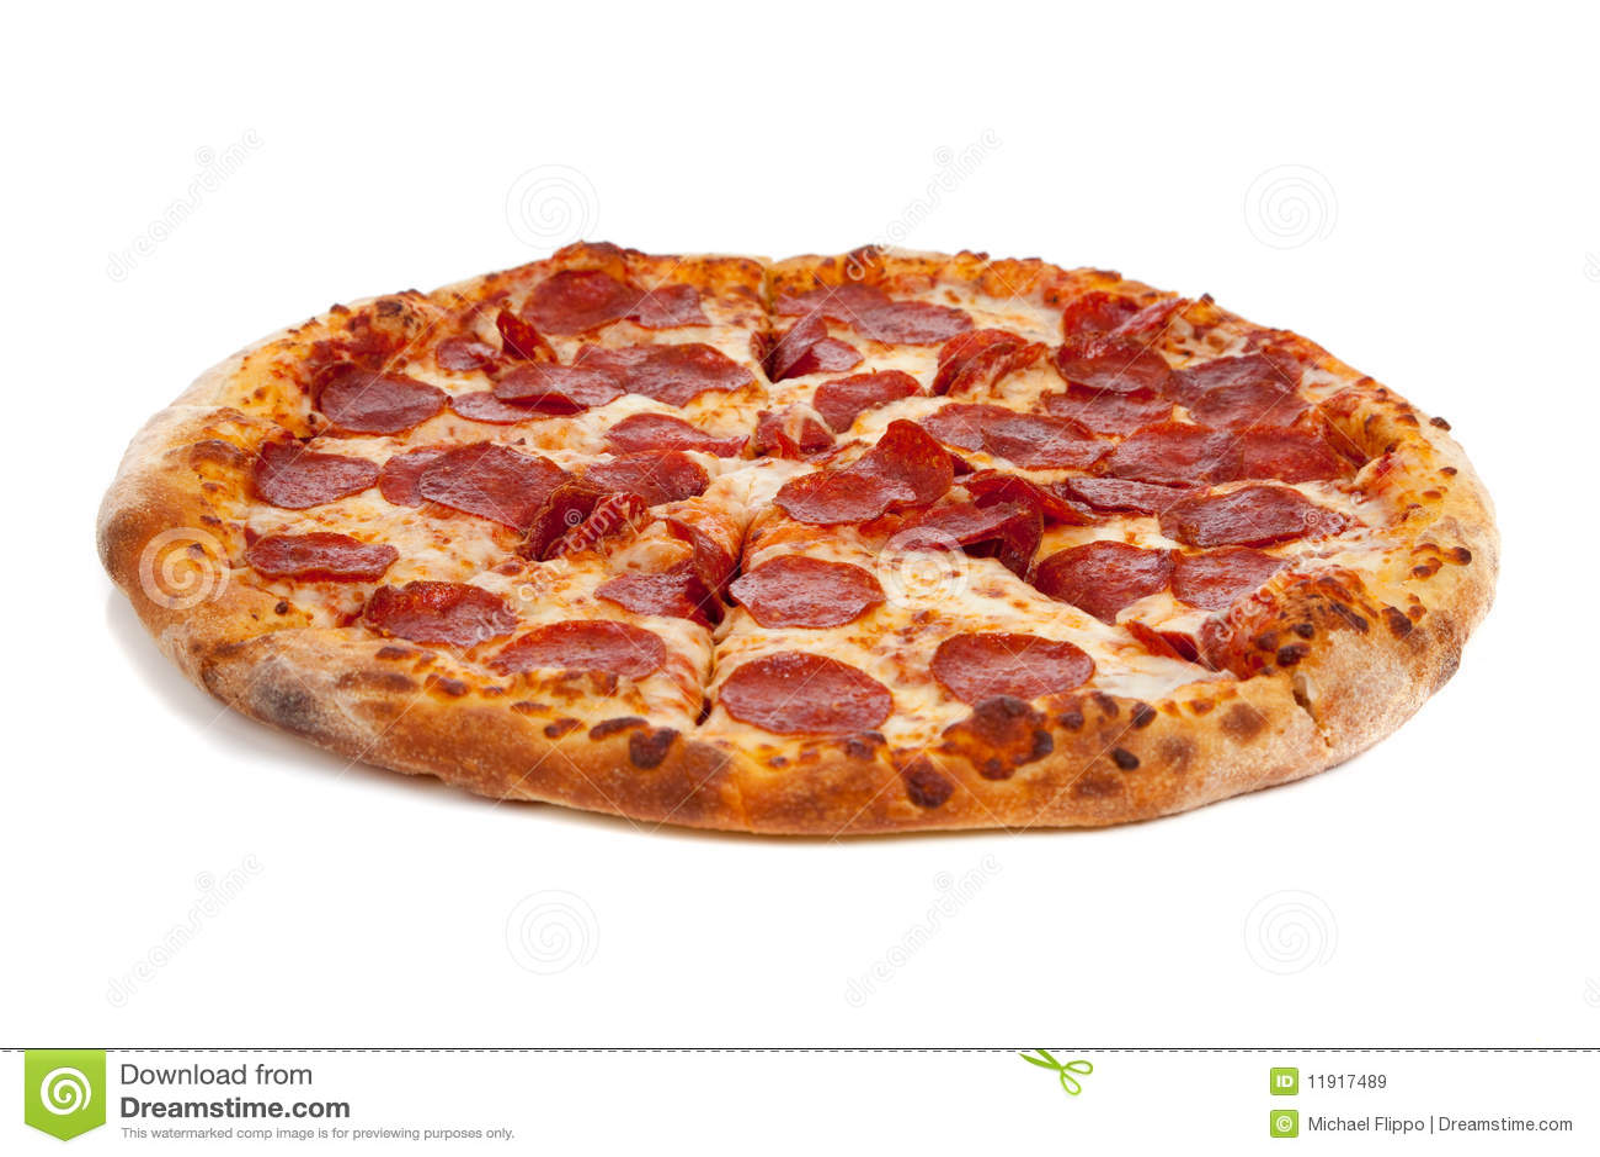 Pizza de salchichones en blanco